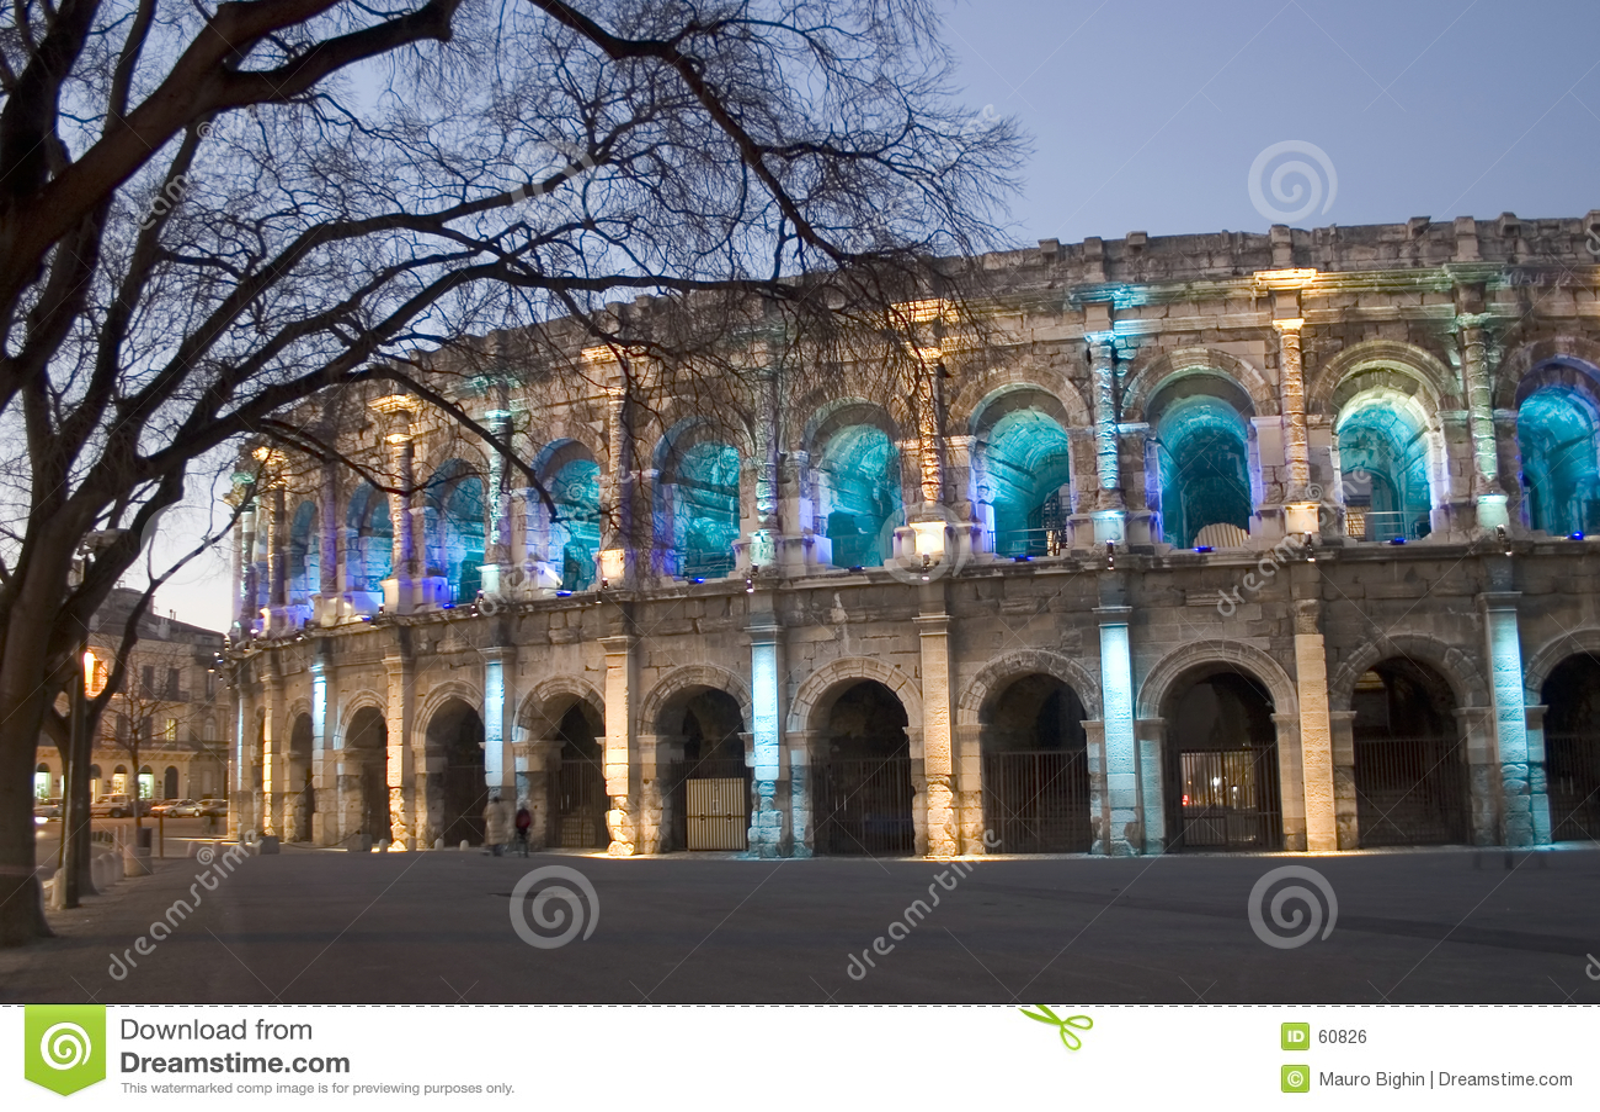 Por la arena romana de NÃimes de la noche (Nimes), Francia, Europa